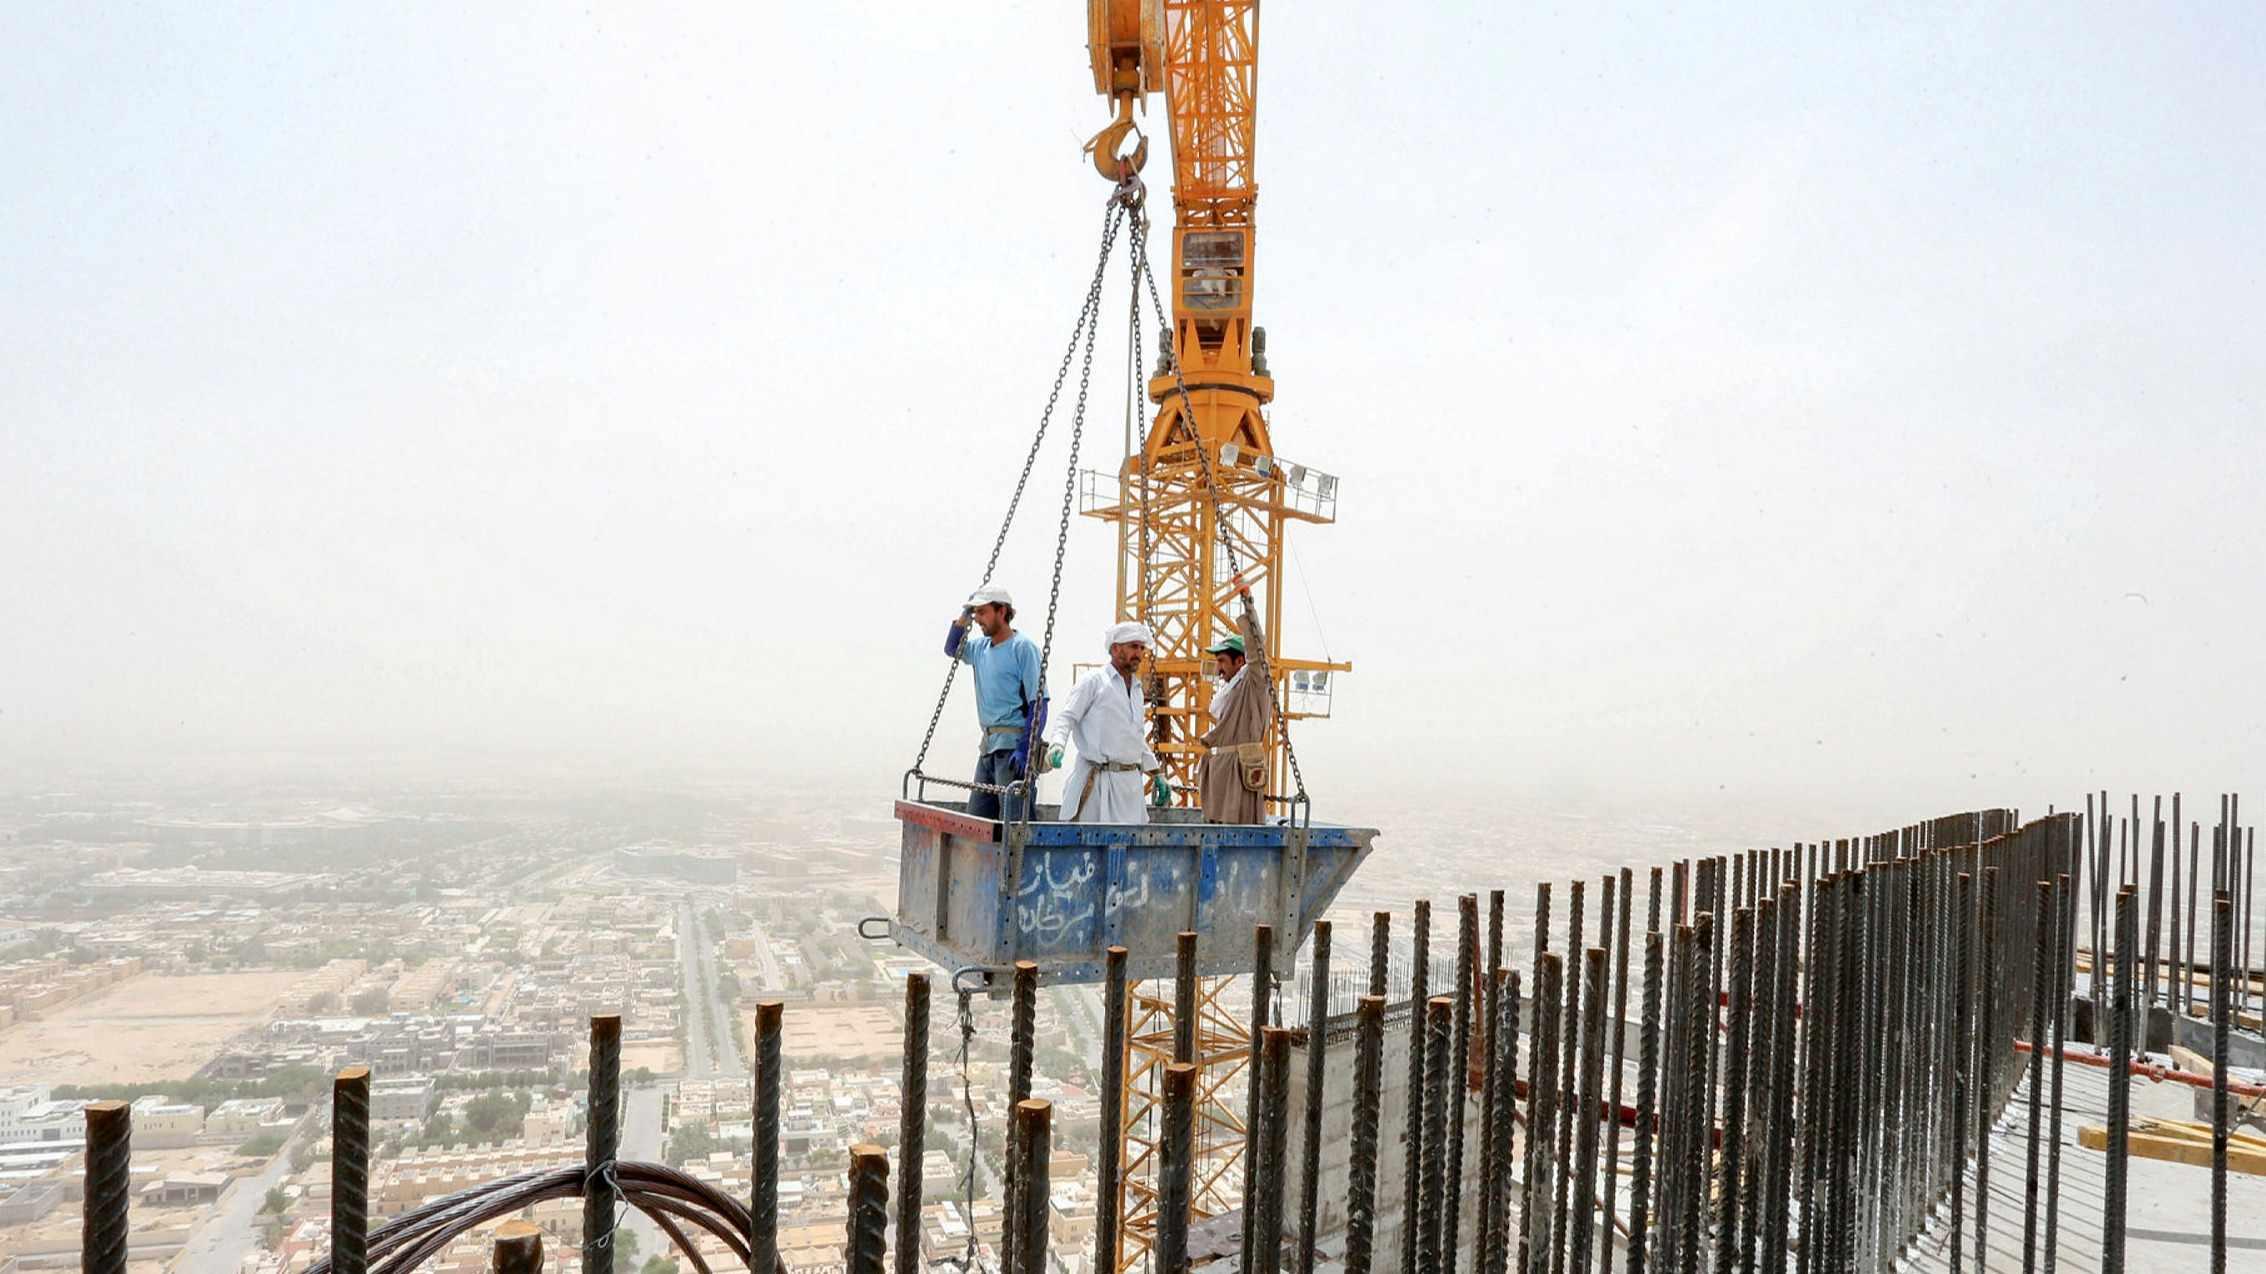 saudi-arabia gulf anchor investor infrastructure